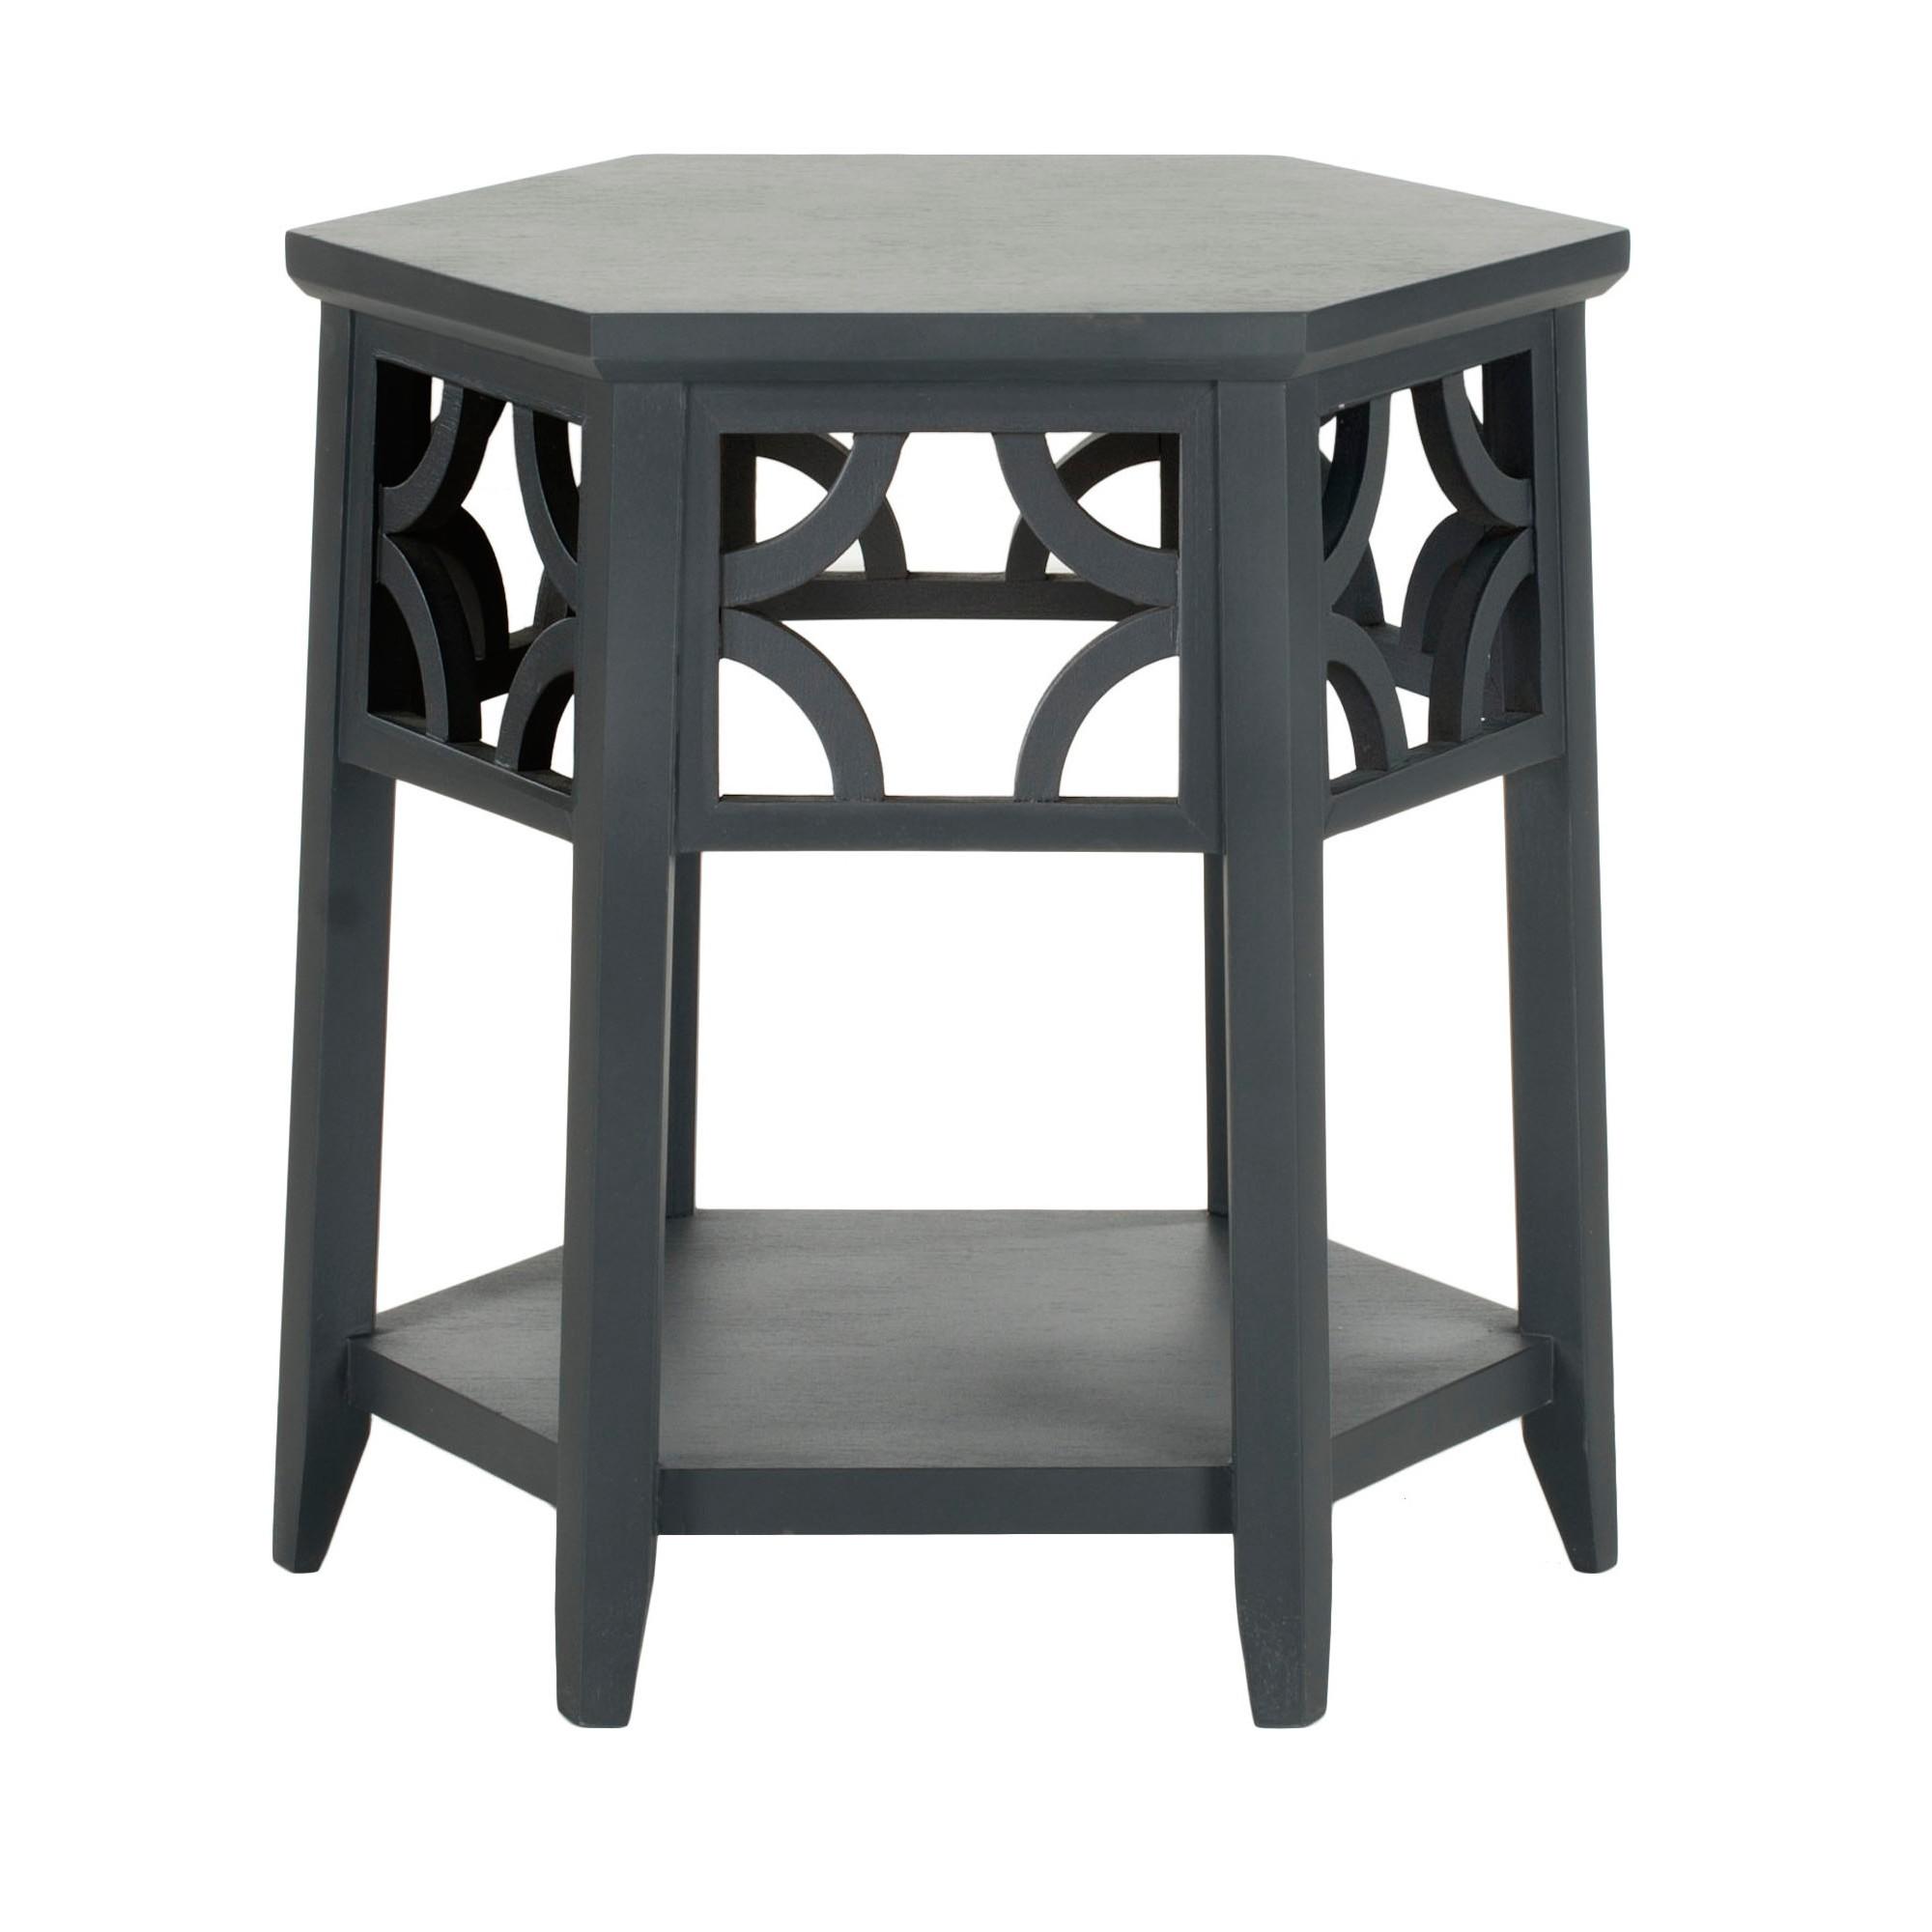 Connr hexagon end table charcoal gray safavieh wood